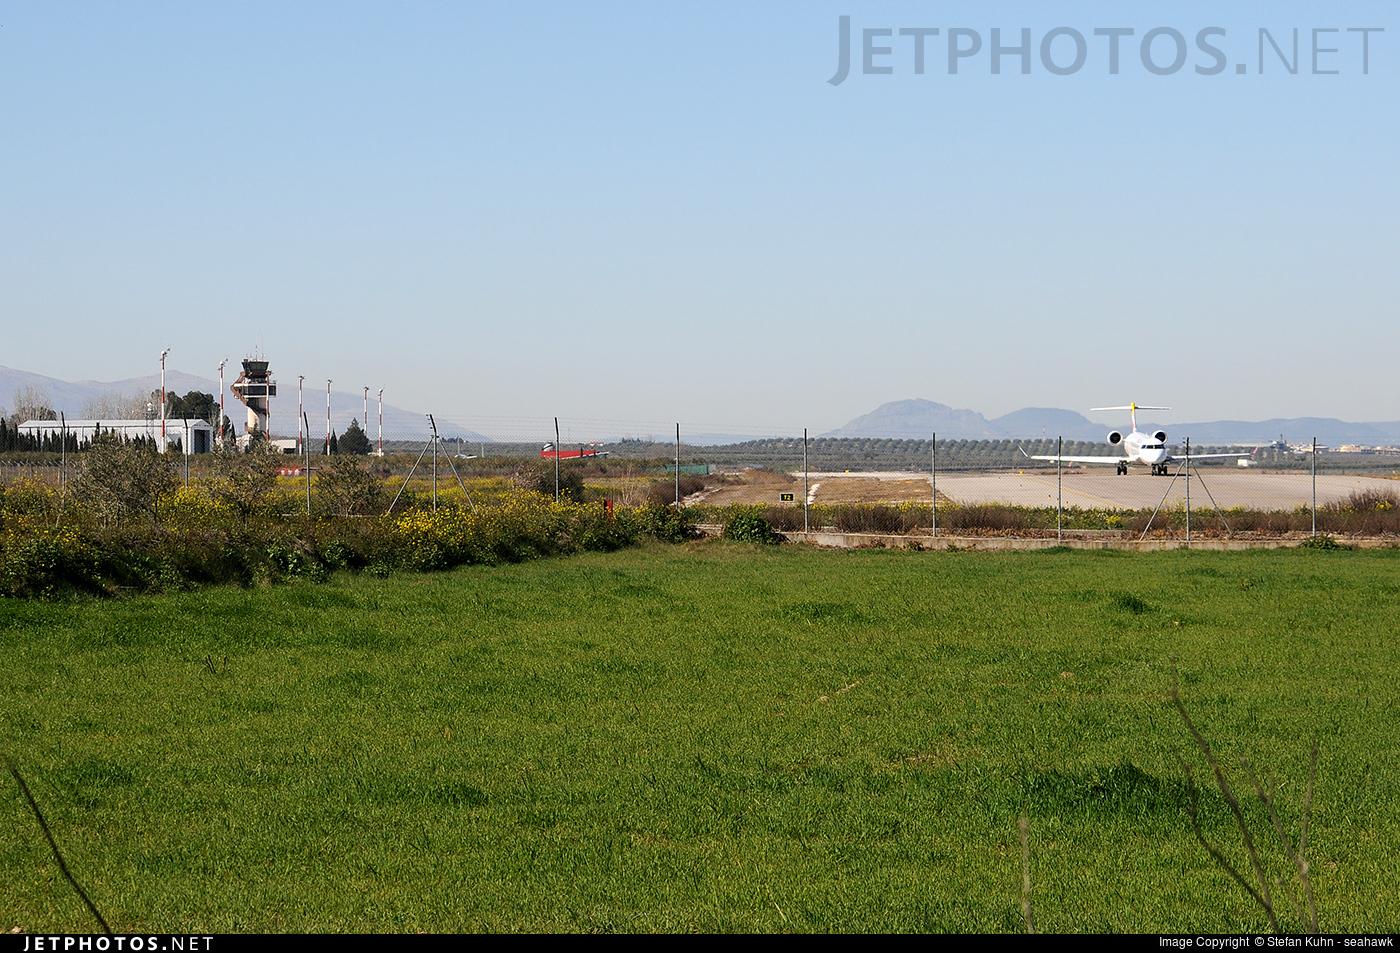 LEGR - Airport - Spotting Location